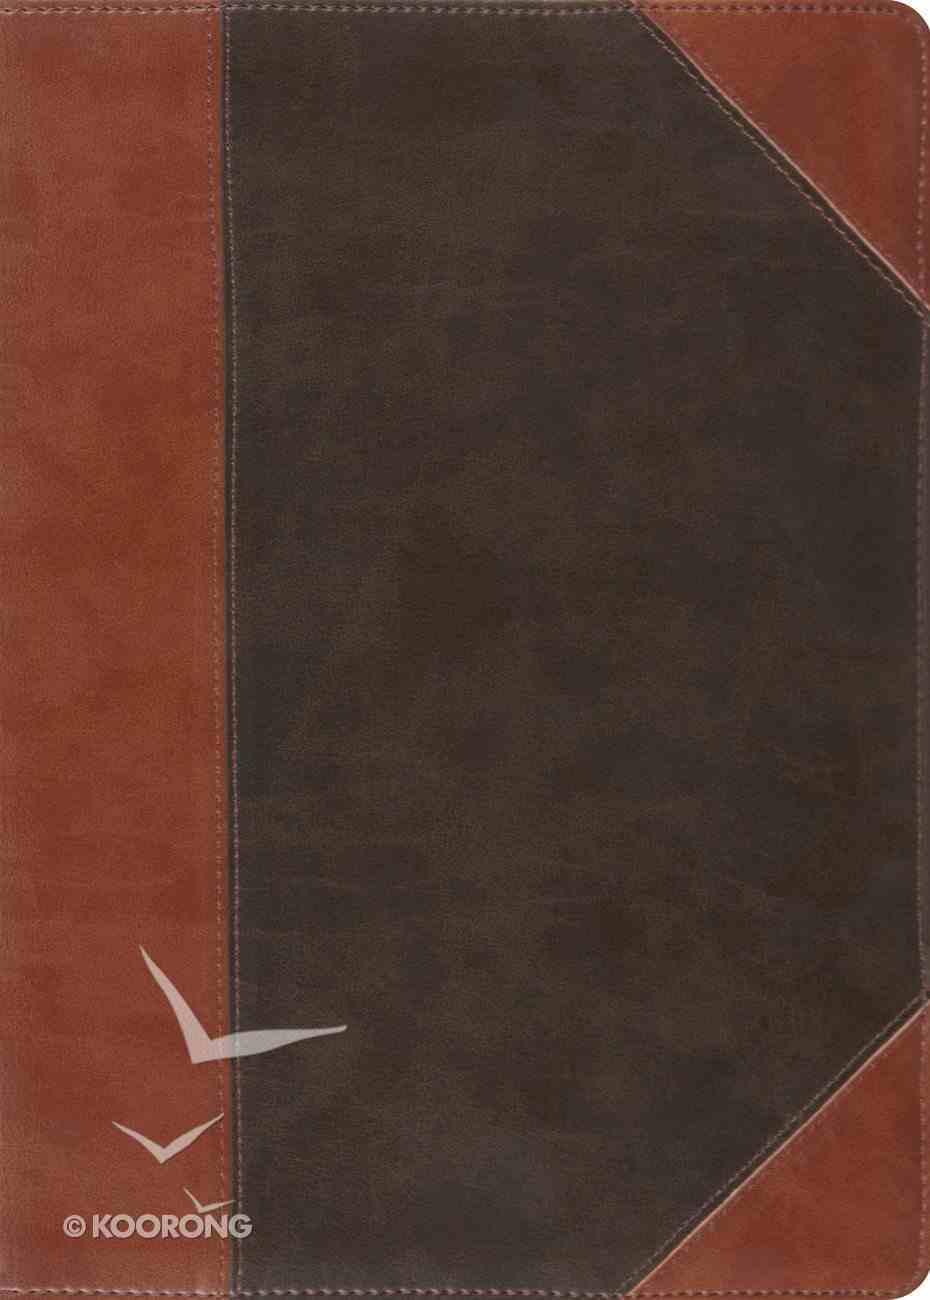 ESV Macarthur Study Forest/Tan Portfolio Design Imitation Leather